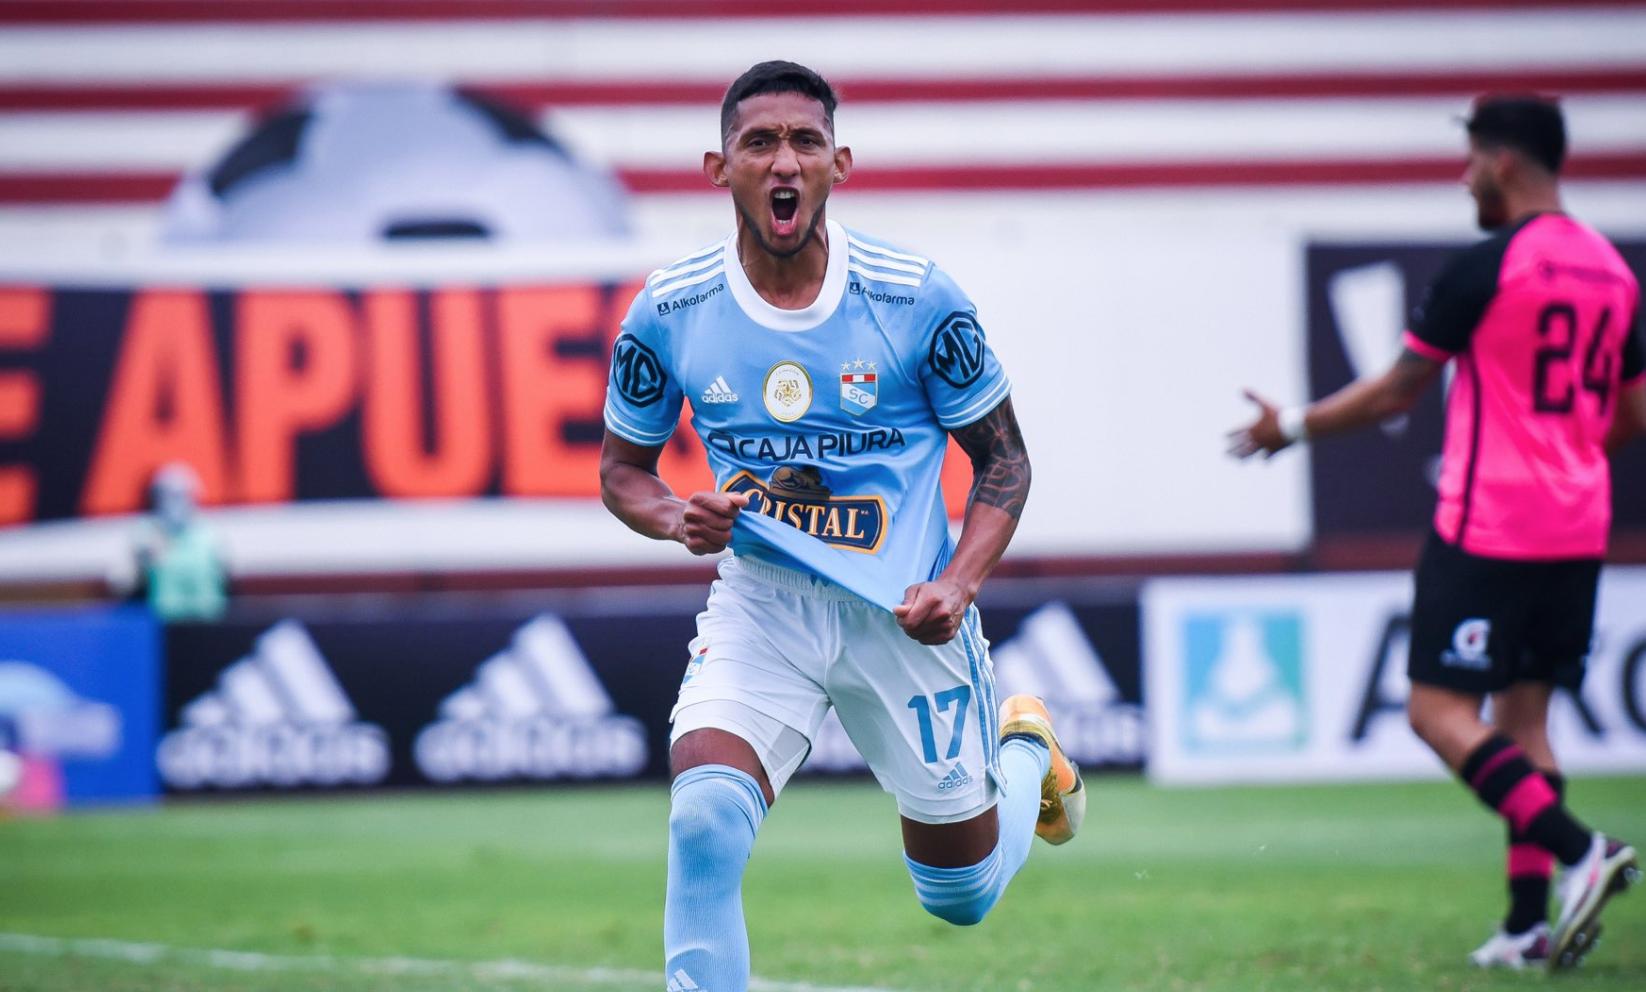 Sporting Cristal venció a Cusco FC y disputará la final de la Fase 1 de la Liga 1 tras ganar el Grupo B